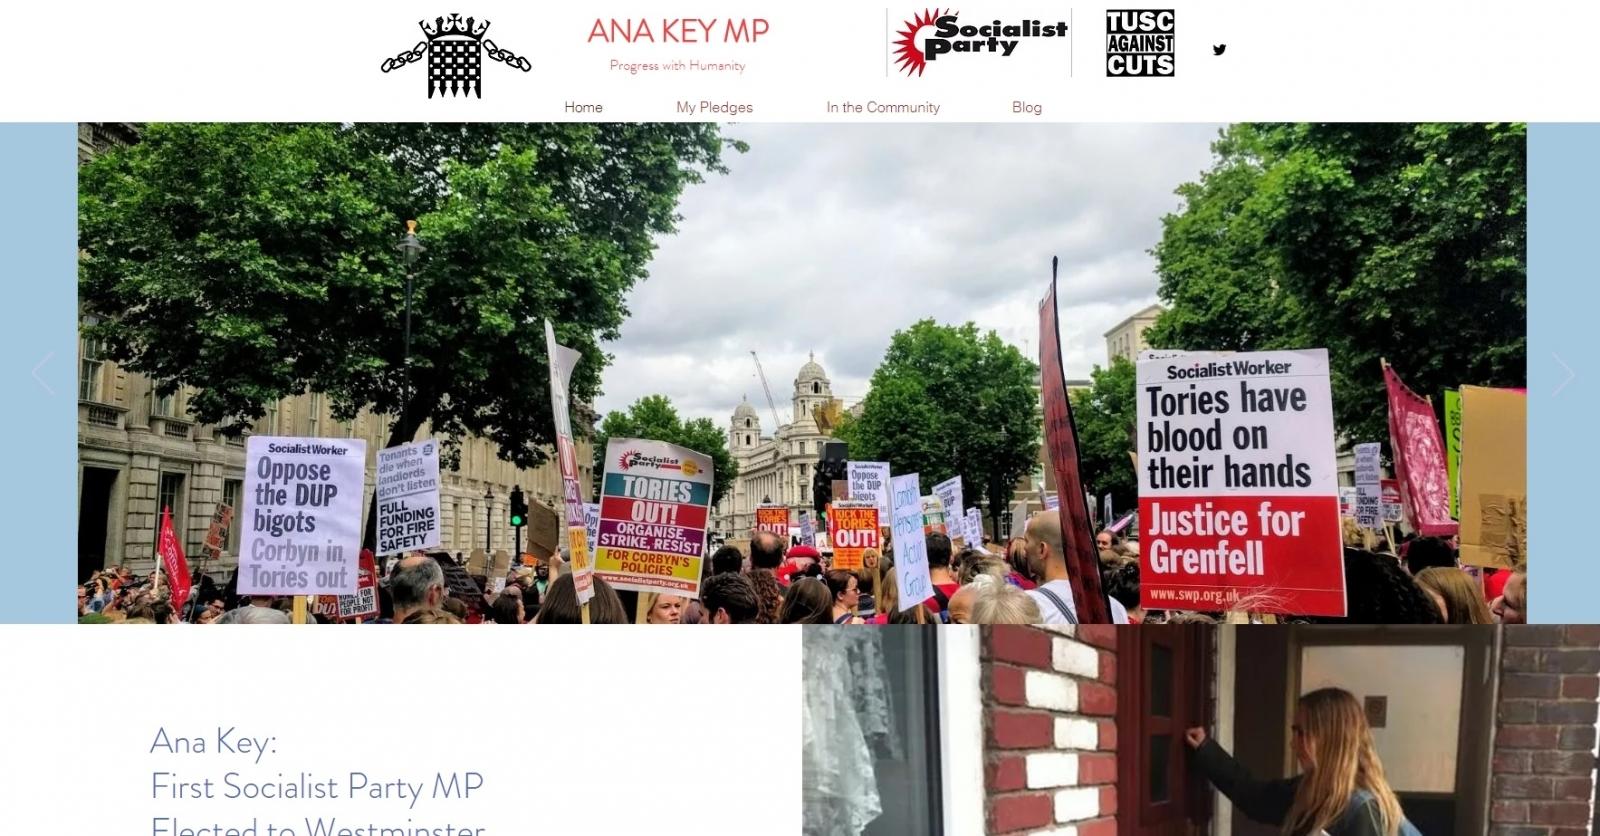 Screenshot of the 'Ana Key MP' website